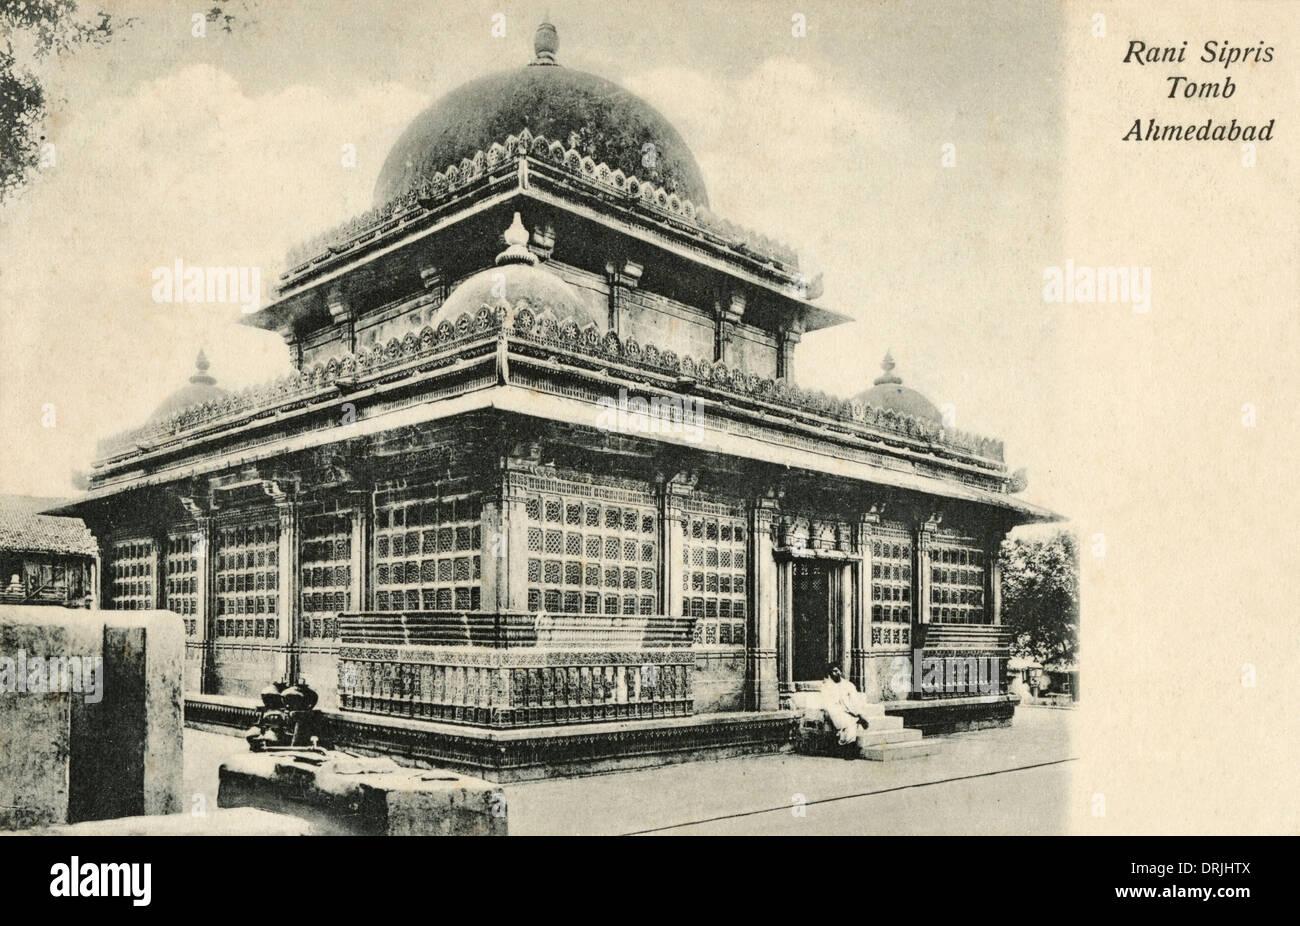 Rani Sipri's Mosque - Ahmedabad - Stock Image